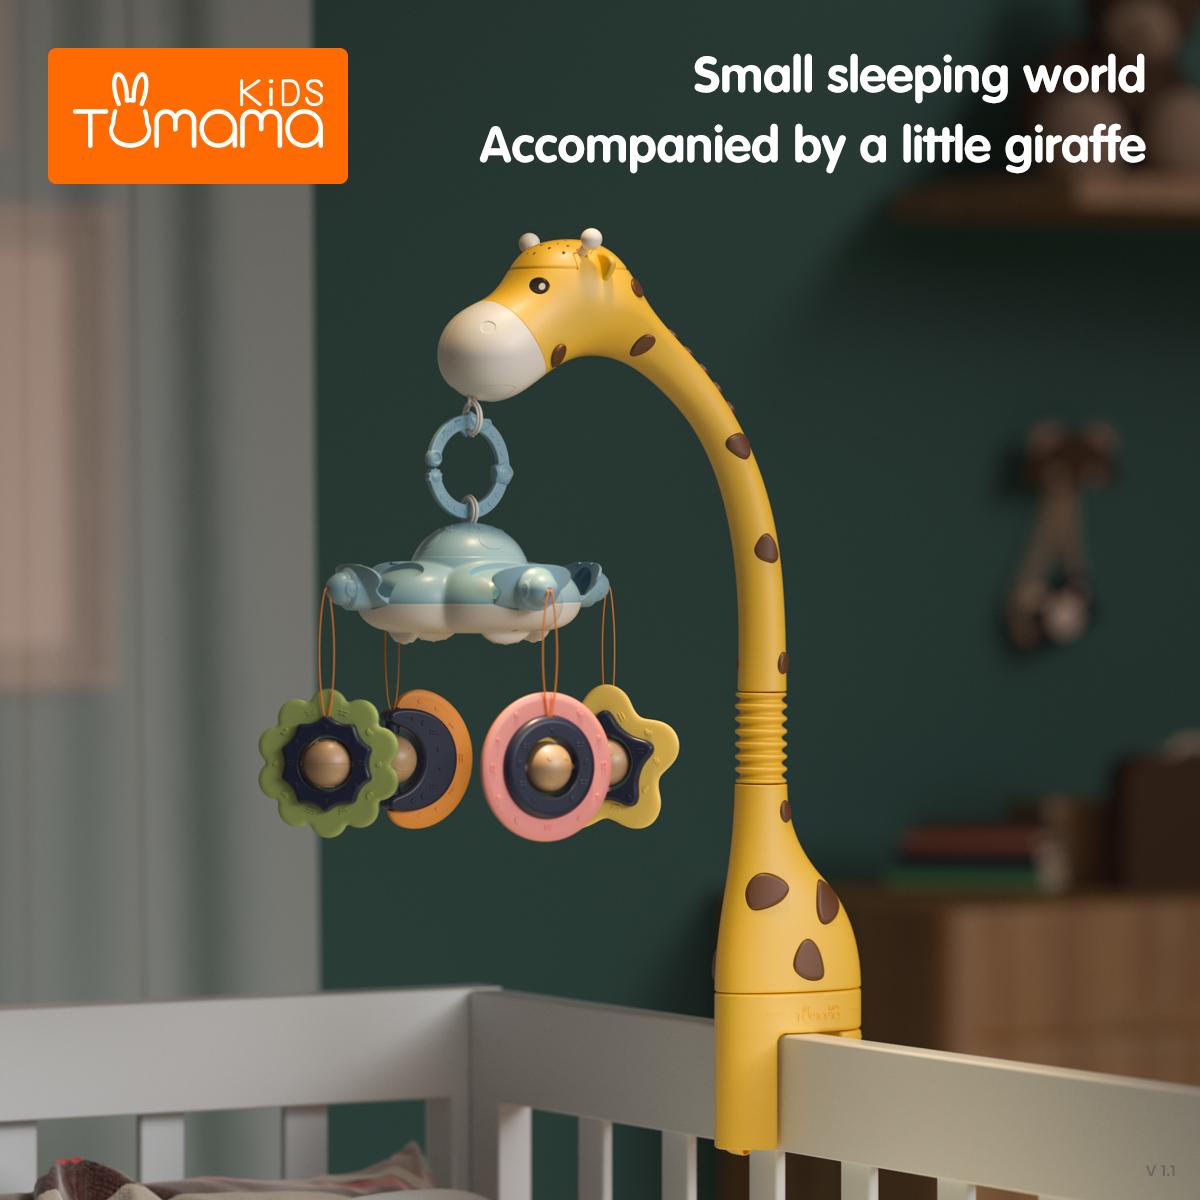 Plastic Newborn Infant giraffe crib toys 360 rotation musical Baby Rattles Crib Mobiles Toy